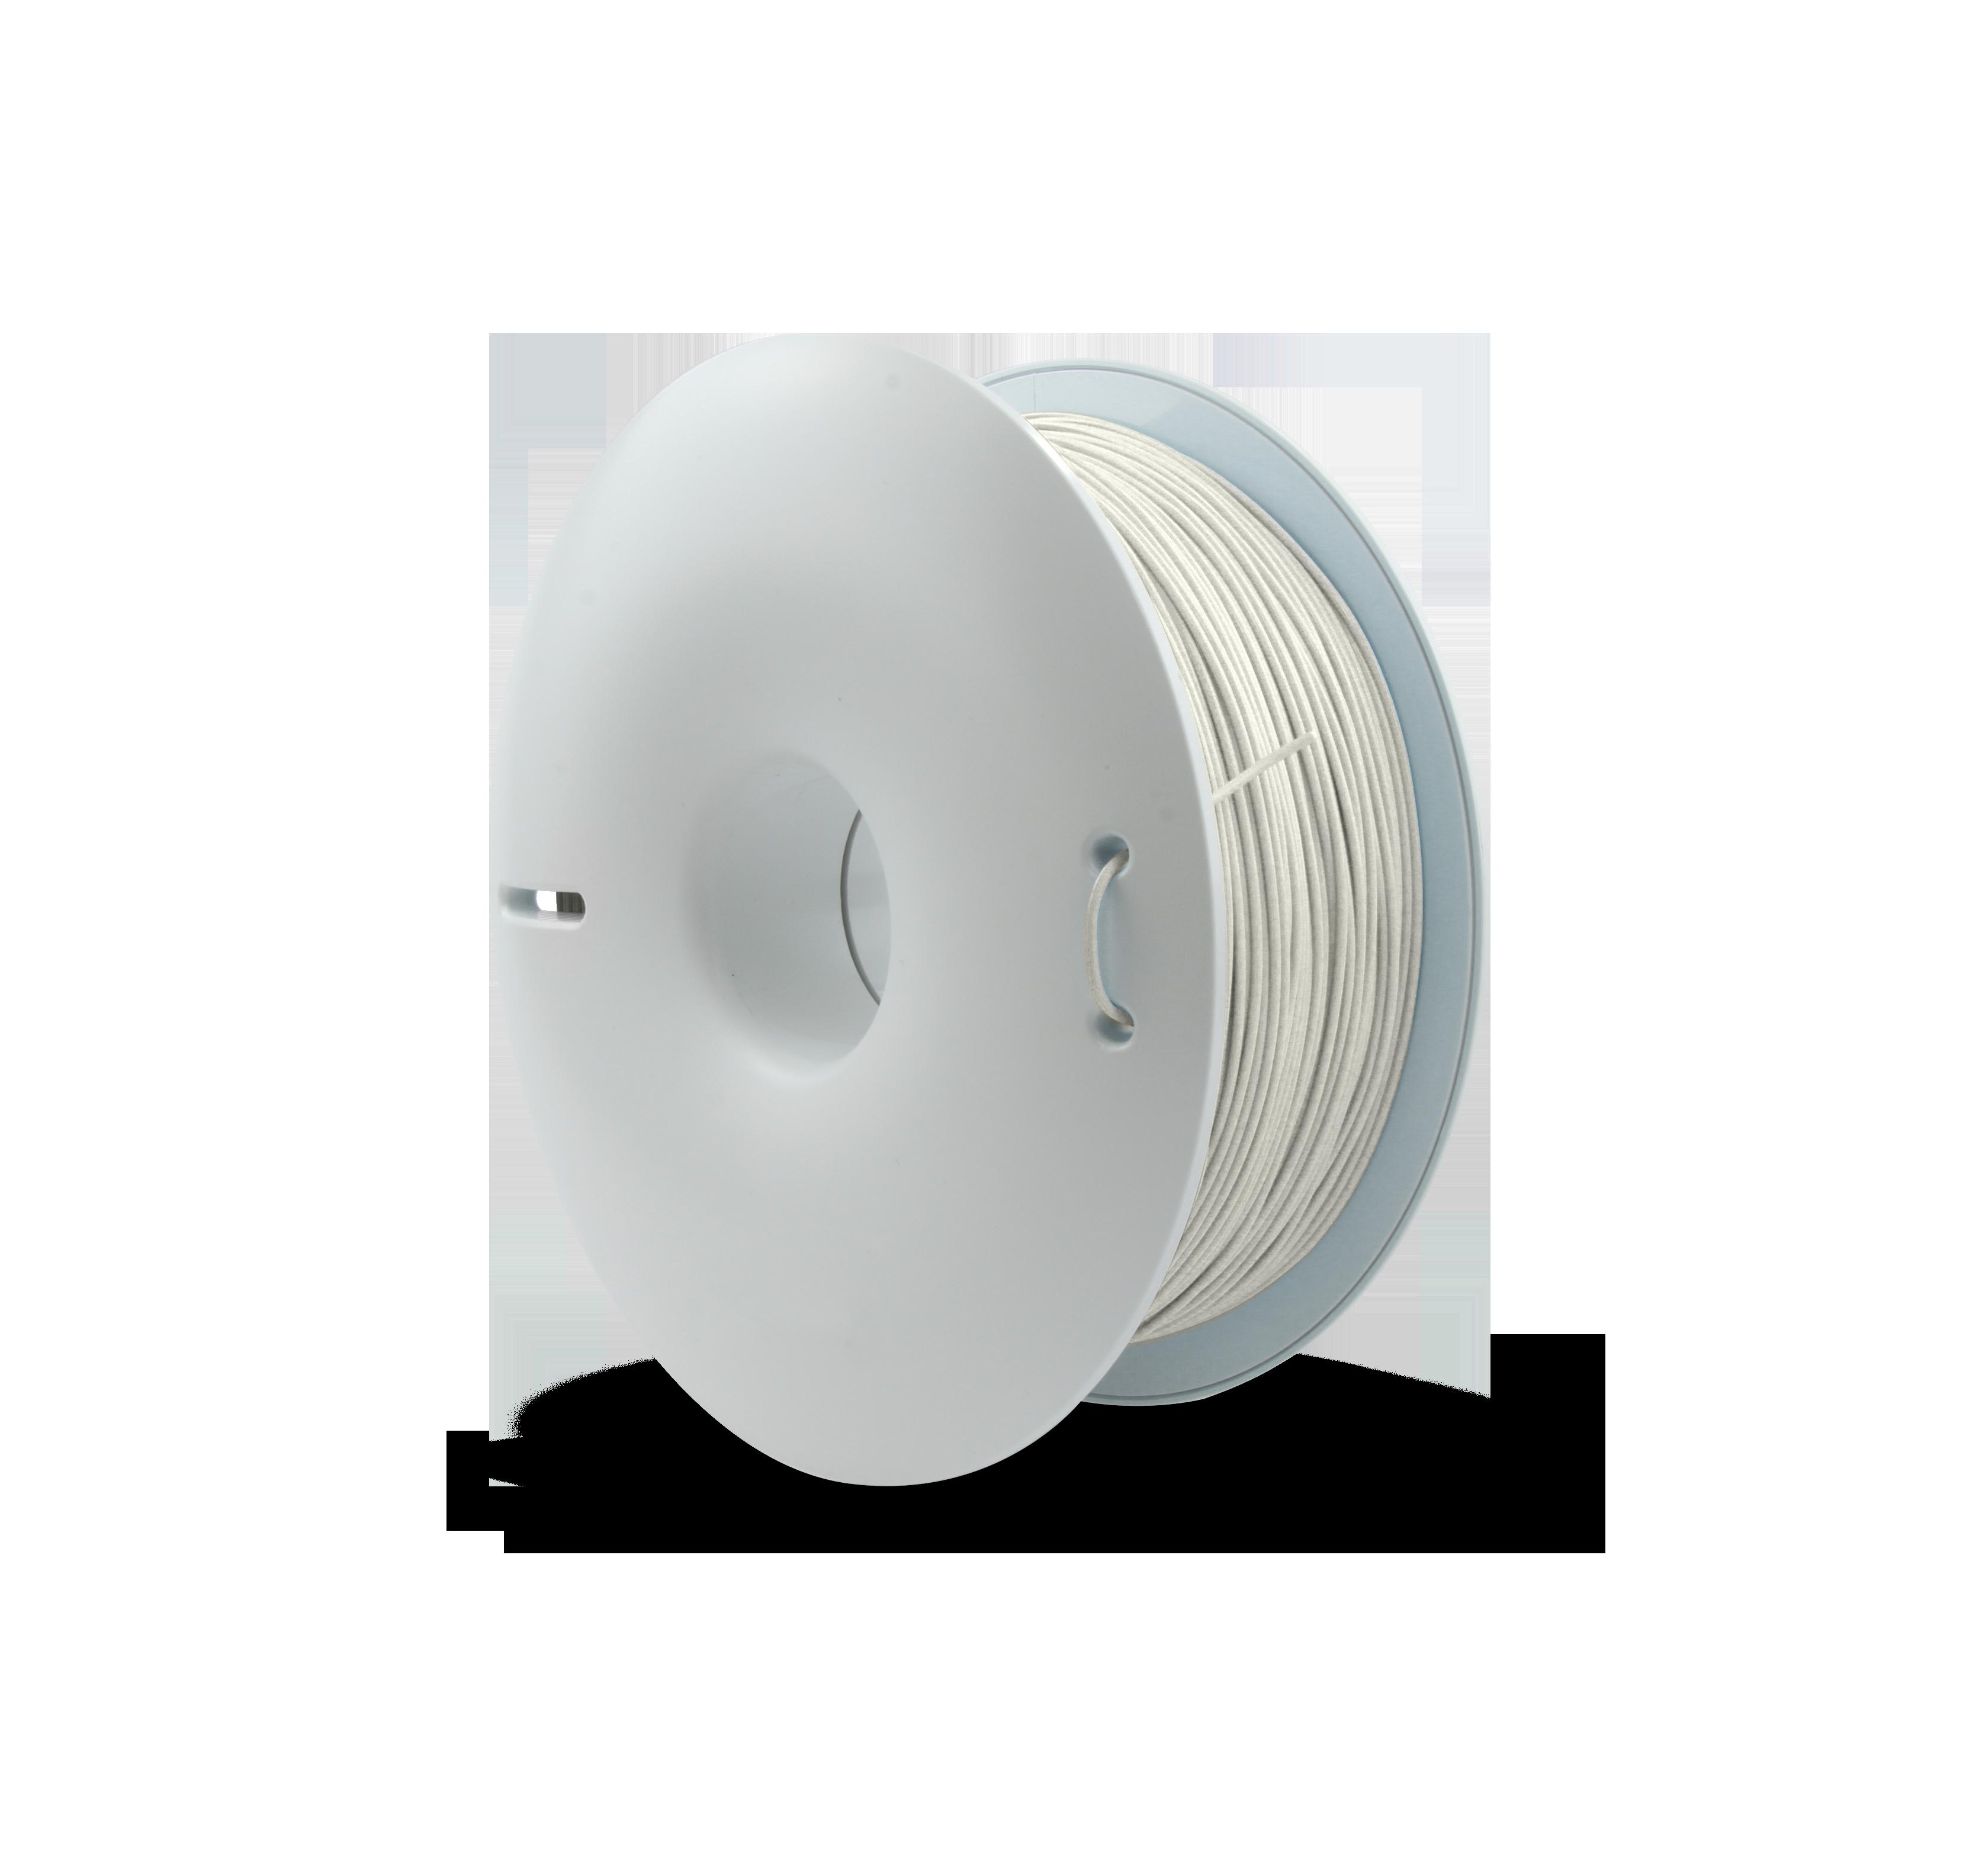 Fiberlogy 3D Filament PP (Polypropylene)